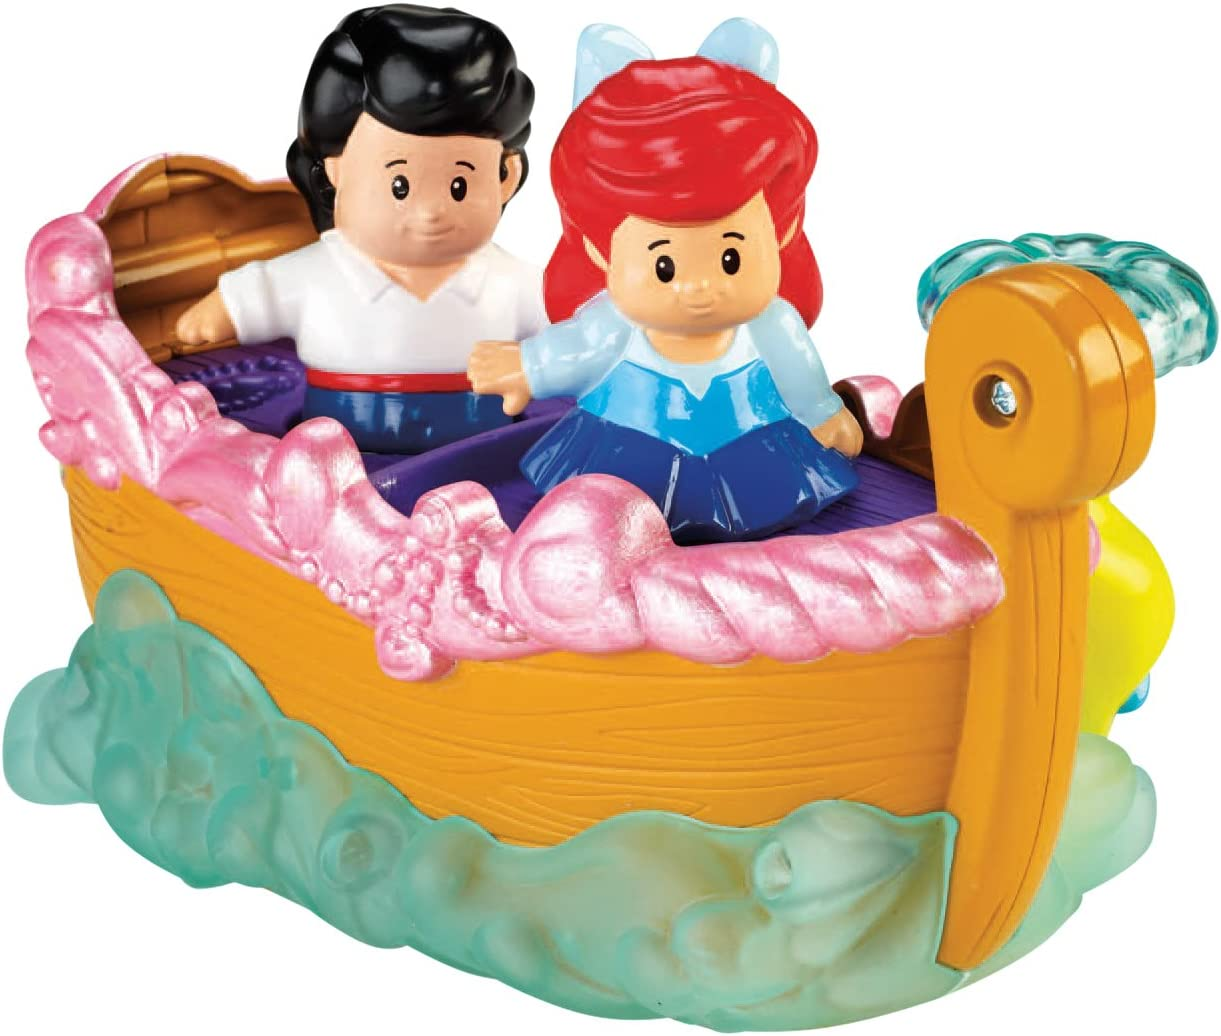 Fisher-Price Little People Disney Princess Ariels Boat Ride Toy by: Amazon.es: Juguetes y juegos